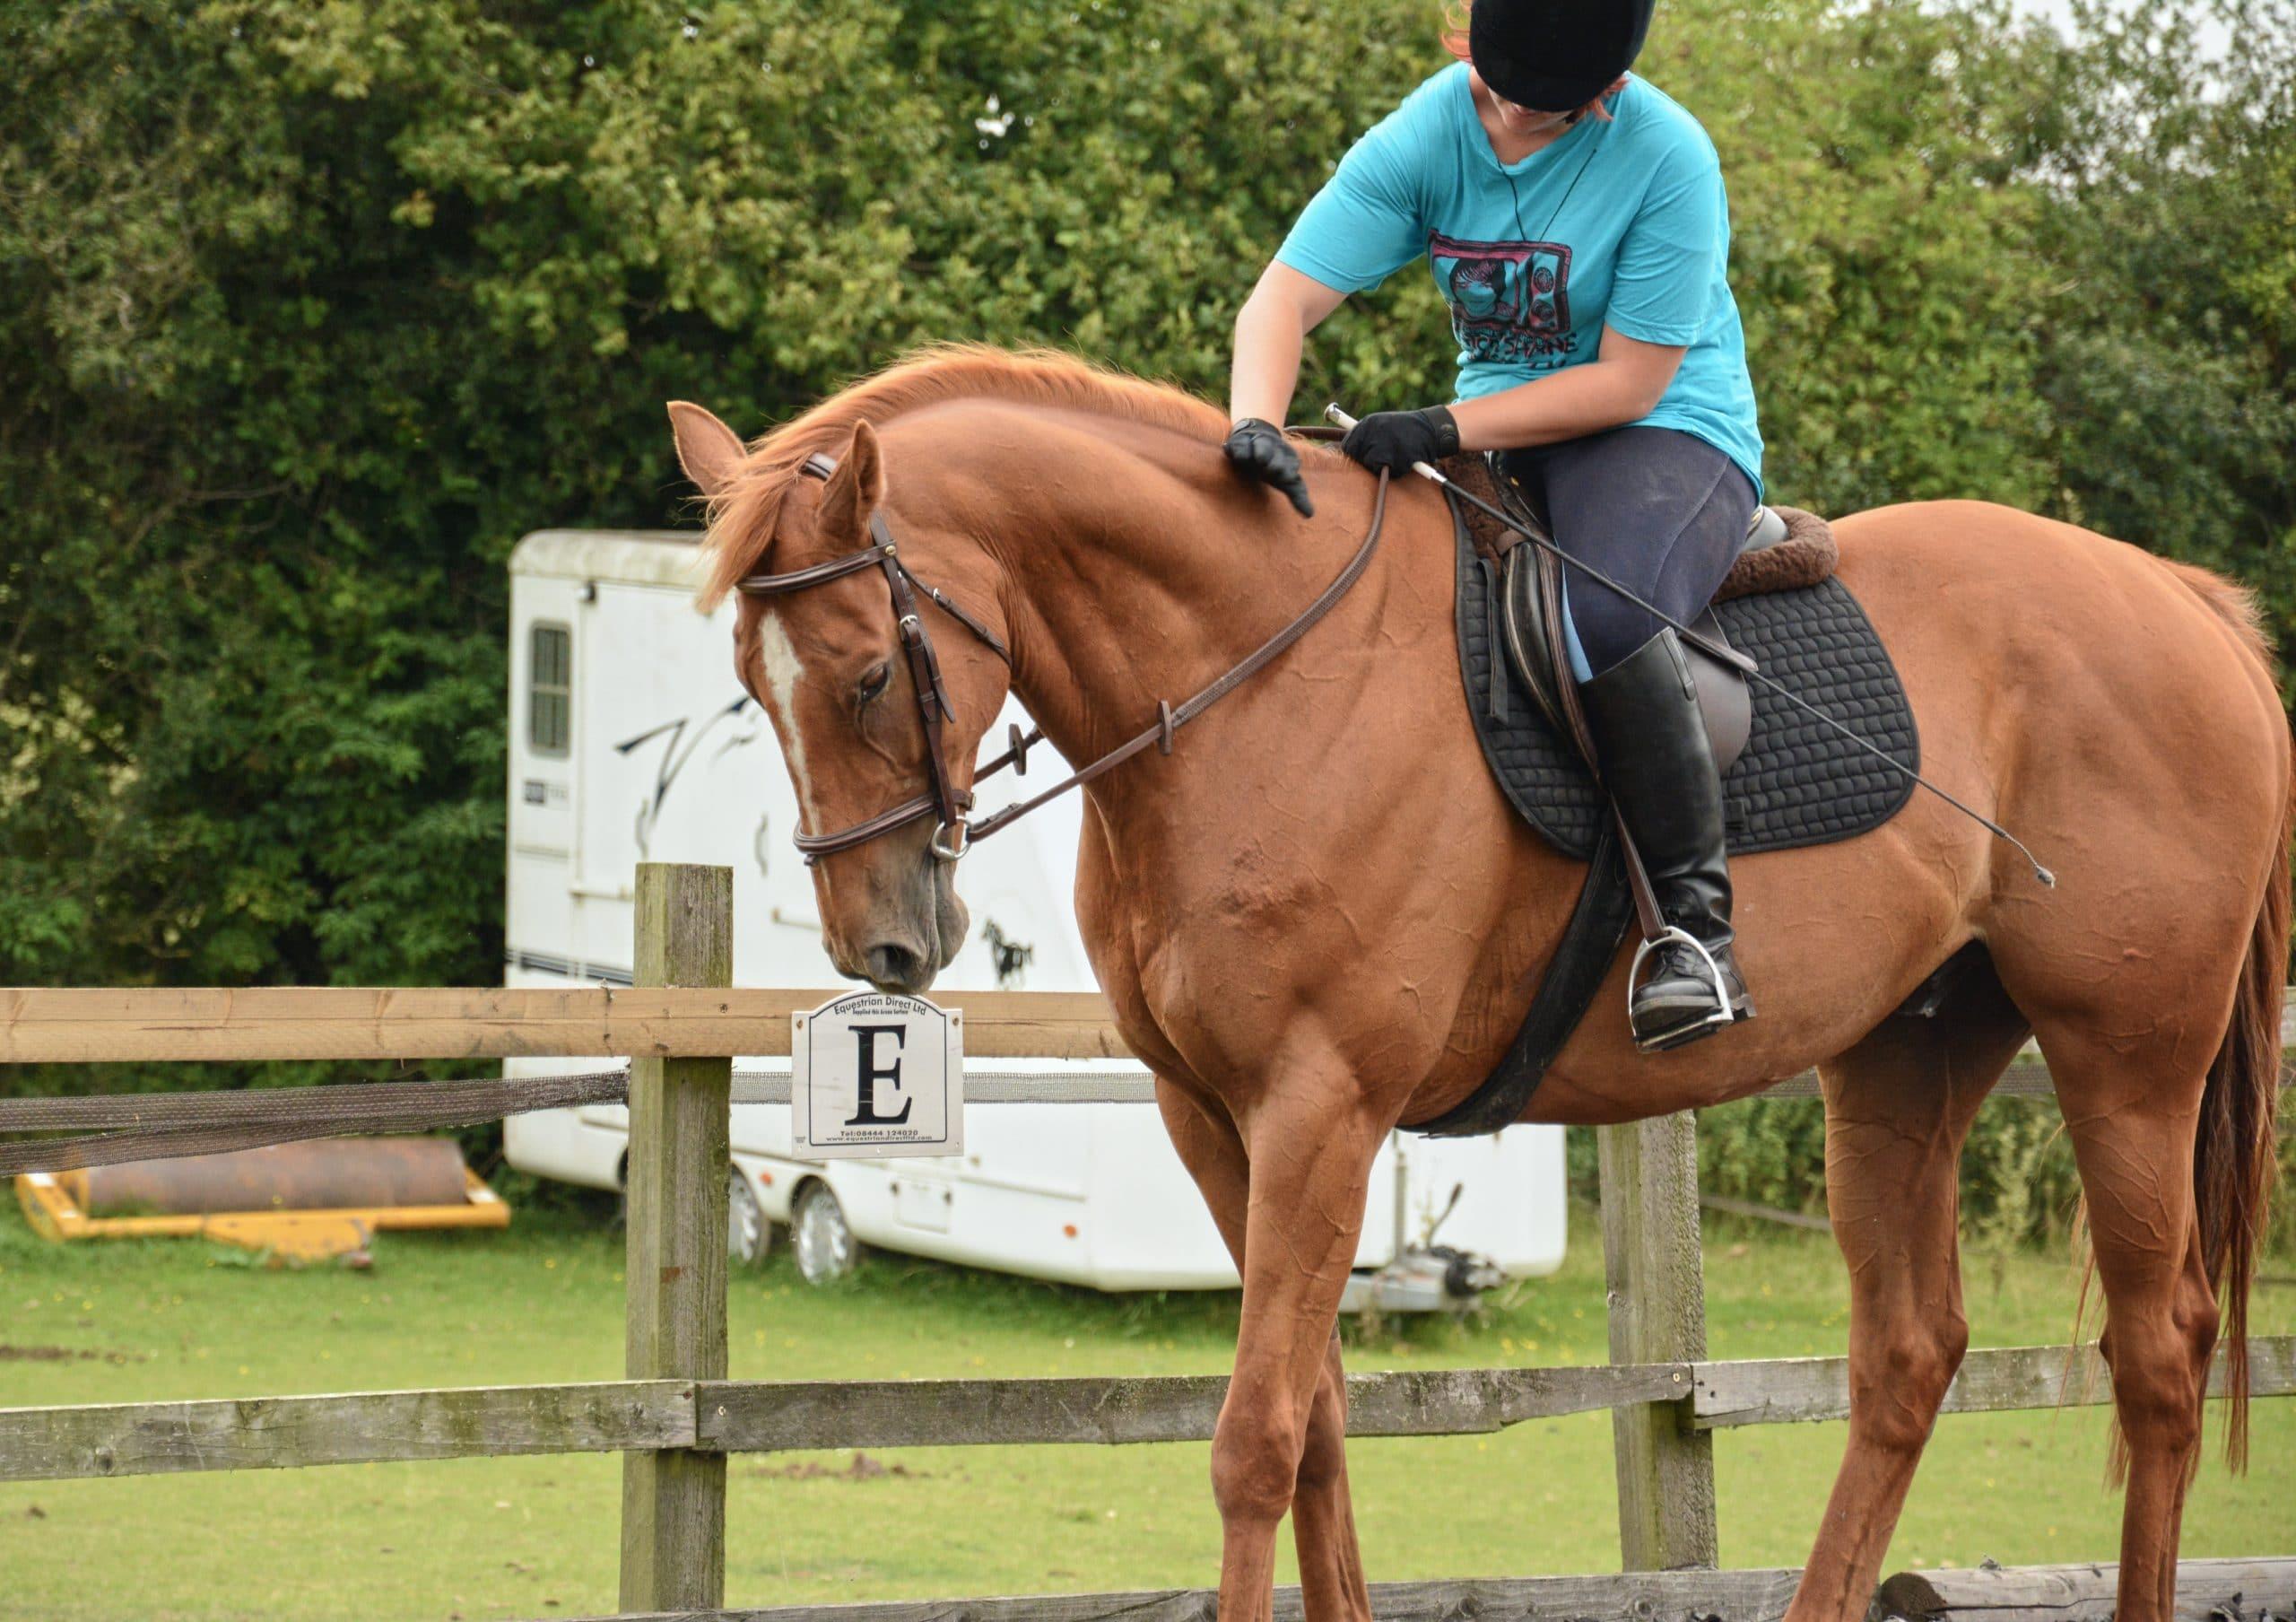 horse owners pet vs hobby